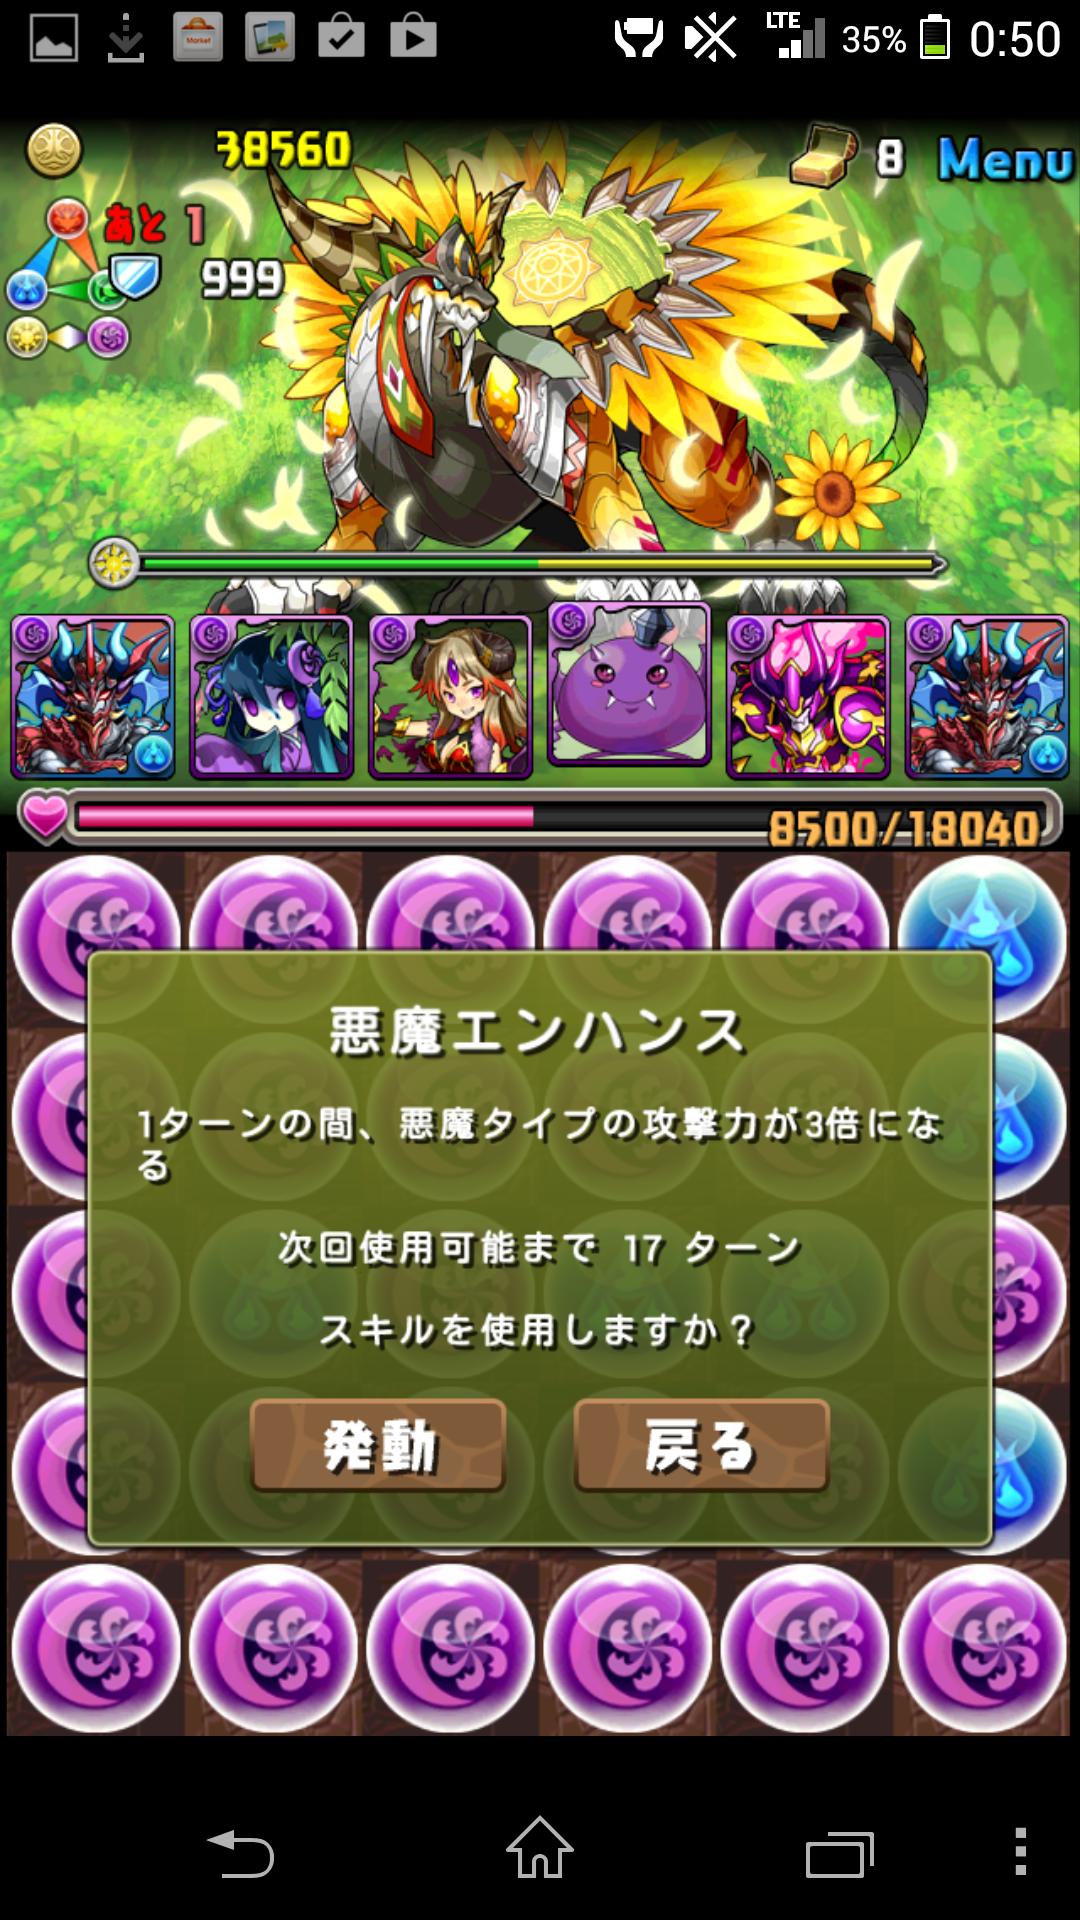 Screenshot_2014-04-19-00-50-16.png